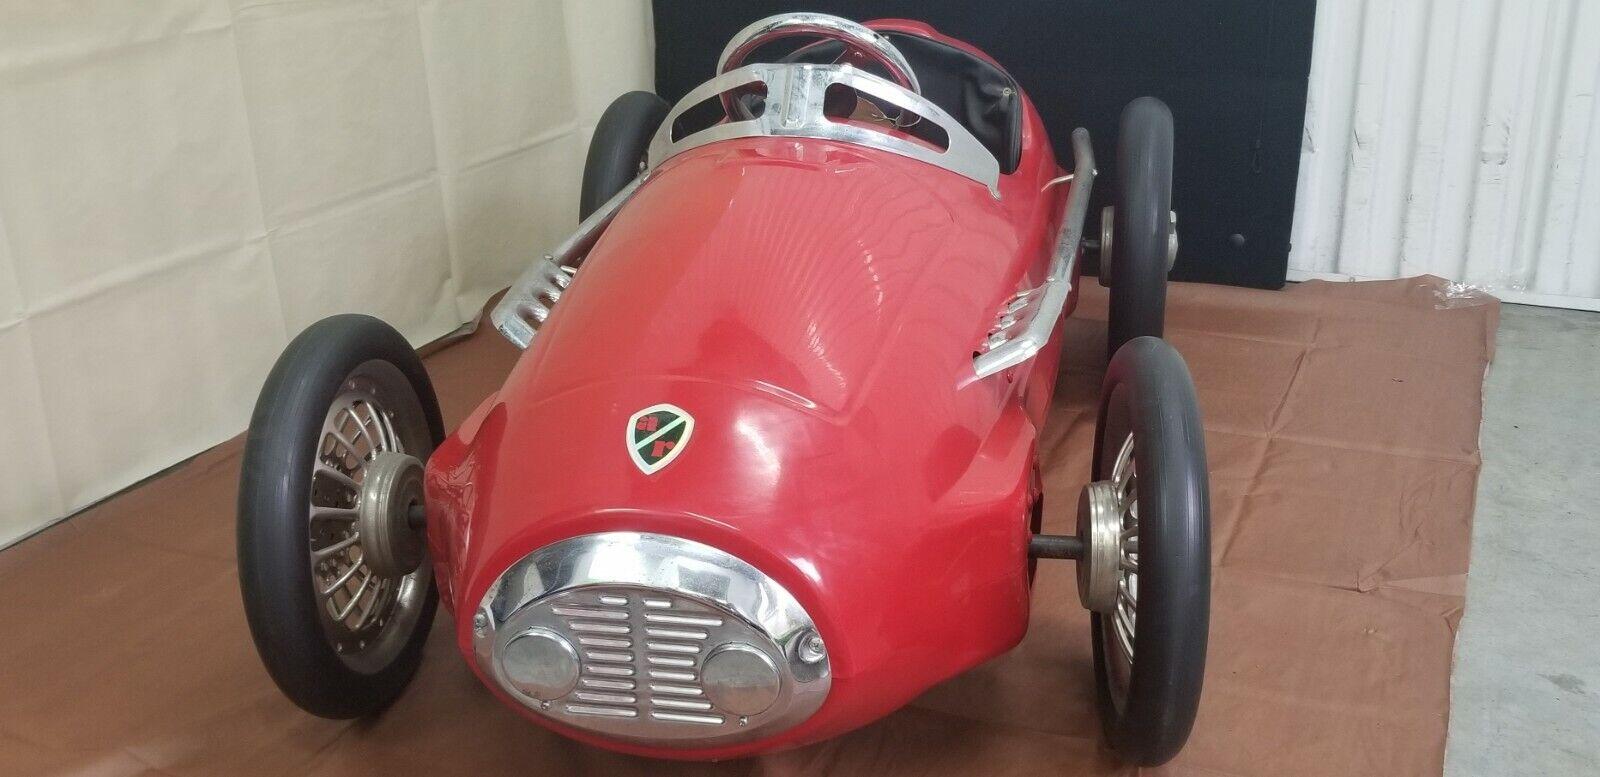 Pedal Car Rare Giordani Racer 1952 Ferrari Formula 2 Ar 5004 American Retro Blk For Sale Online Ebay